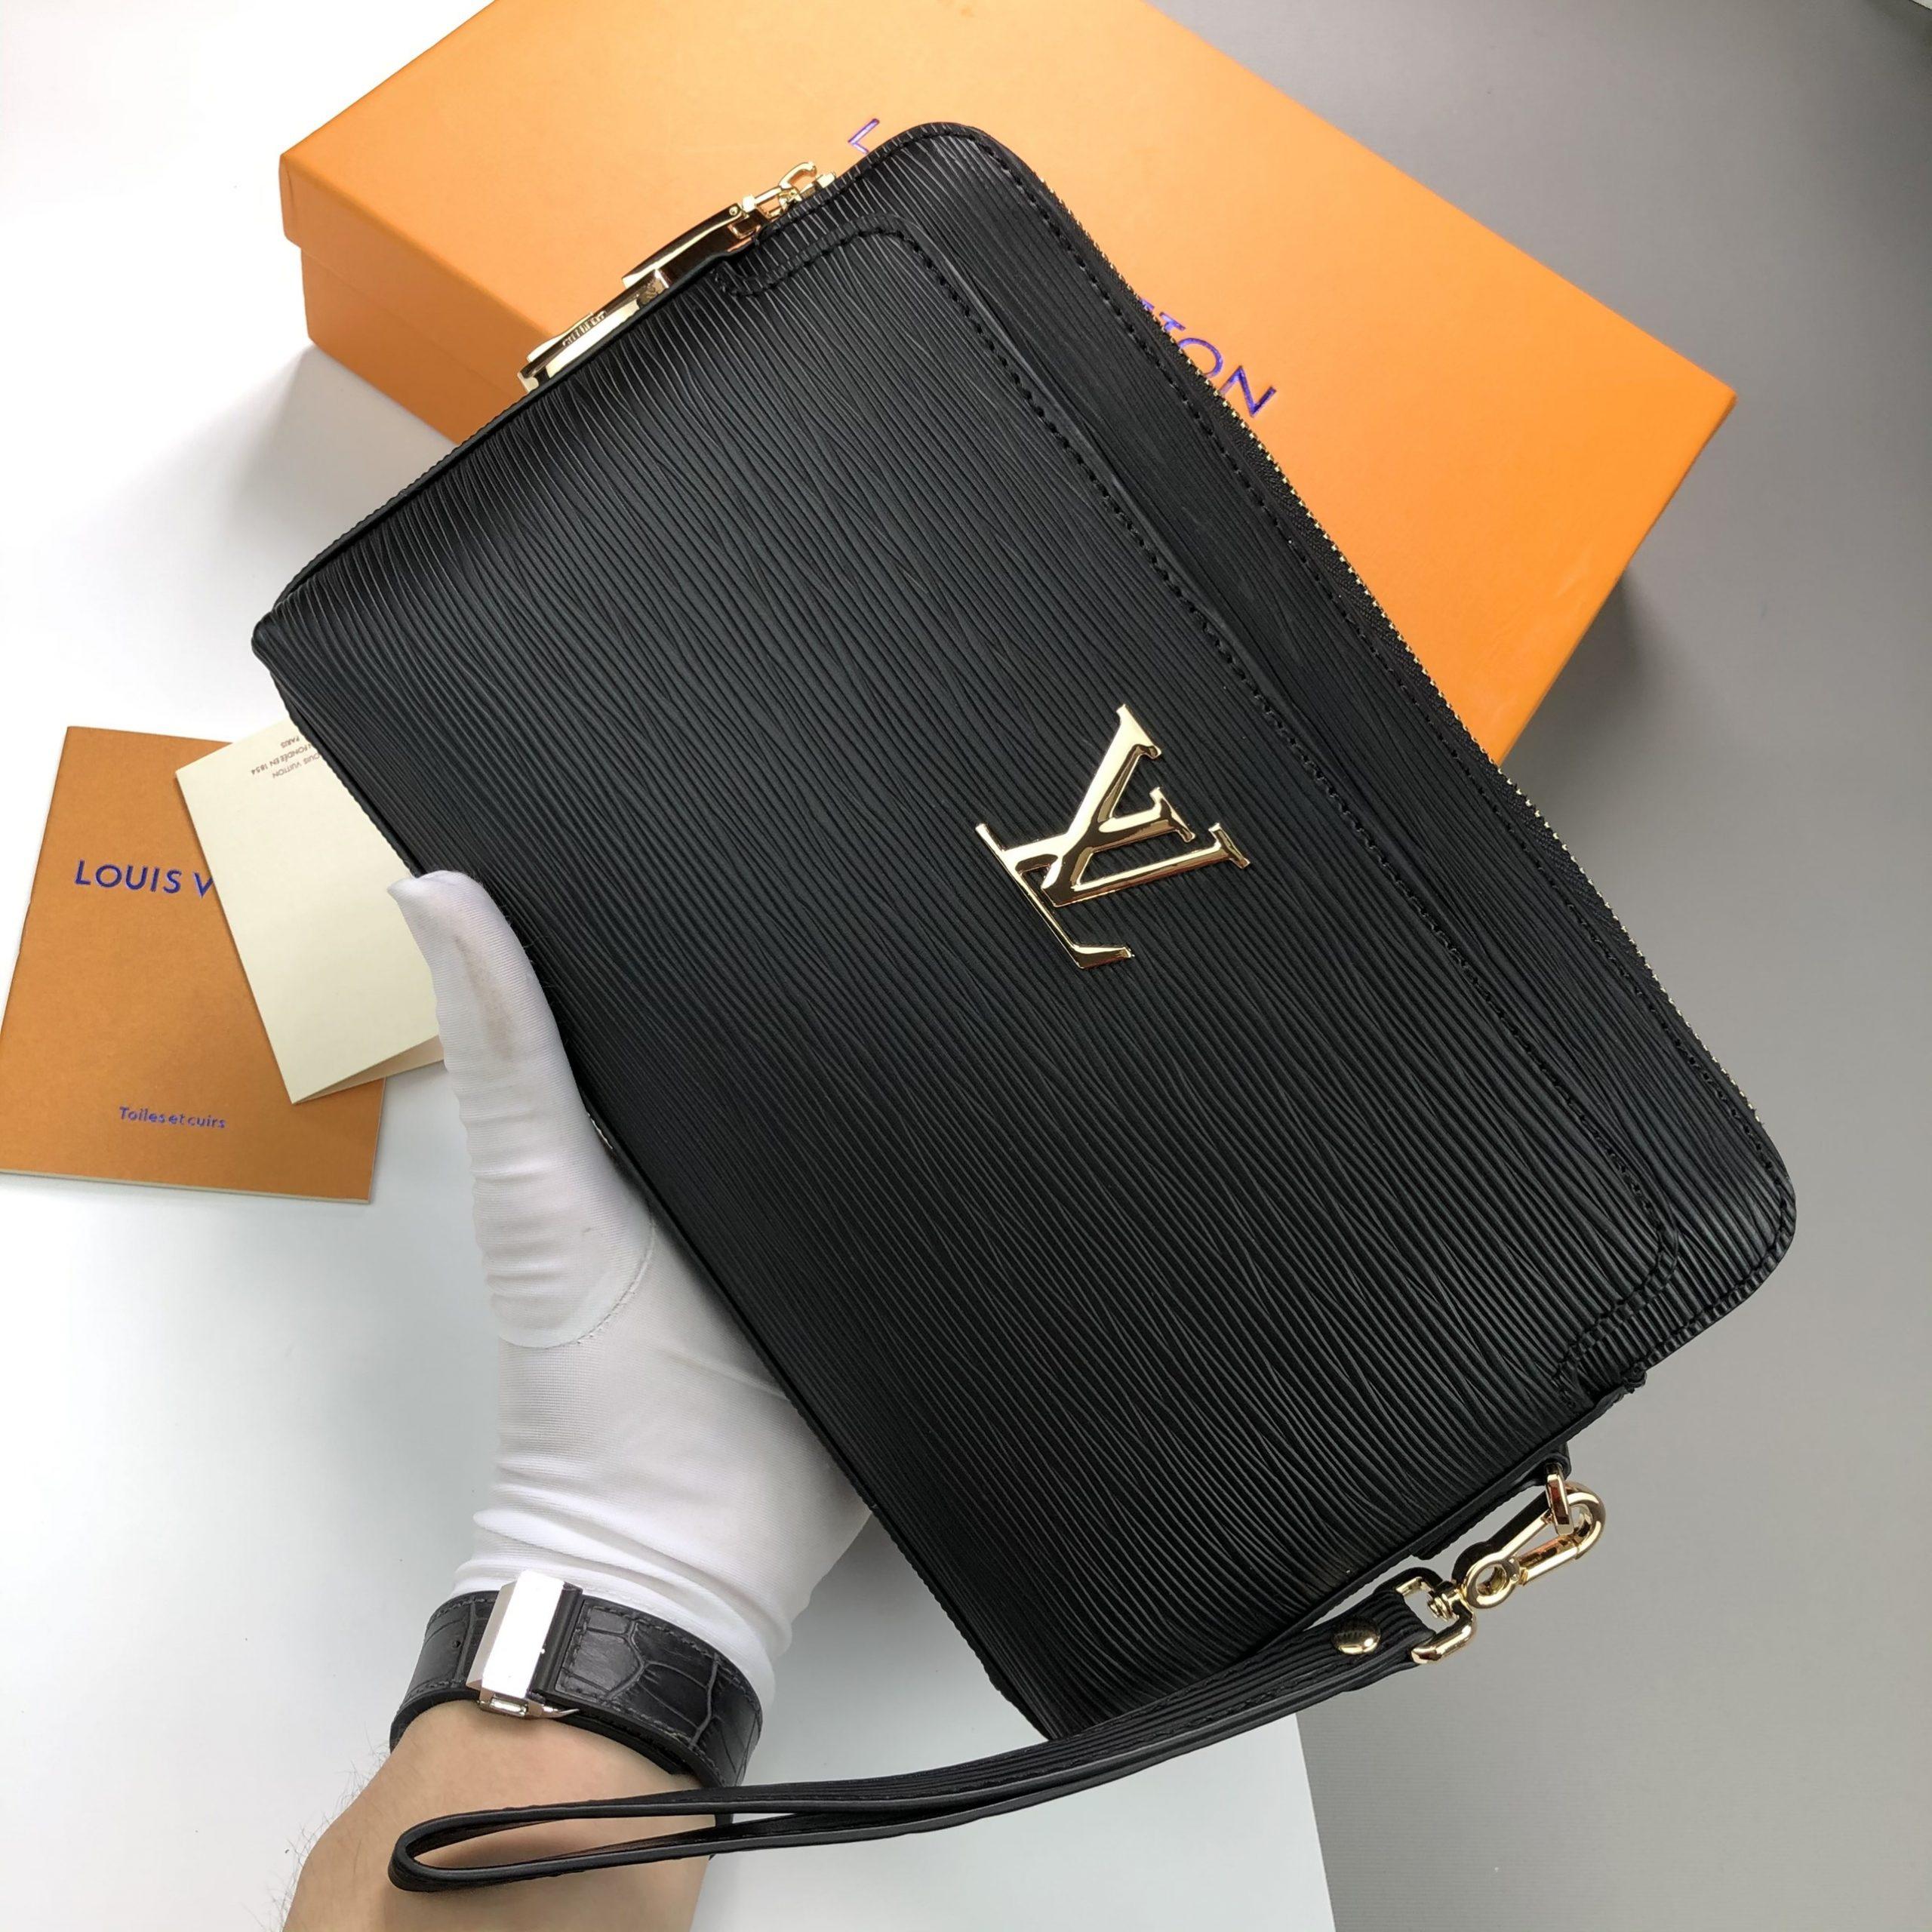 Louis Vuitton New Clutch EPI